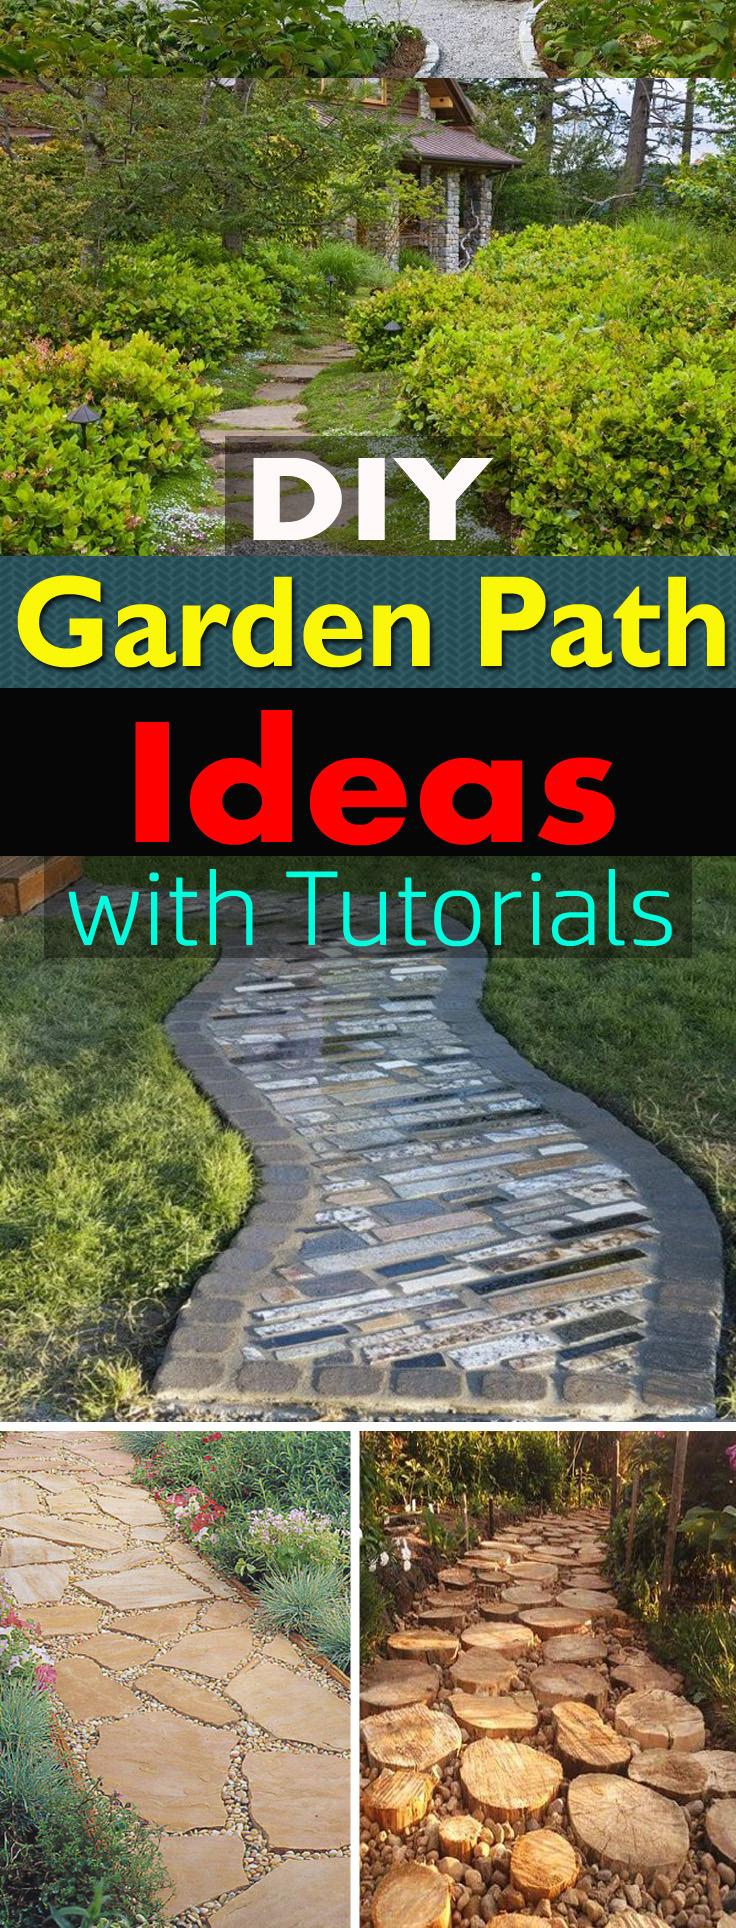 19 DIY Garden Path Ideas With Tutorials | Balcony Garden Web on Backyard Landscape  id=26451